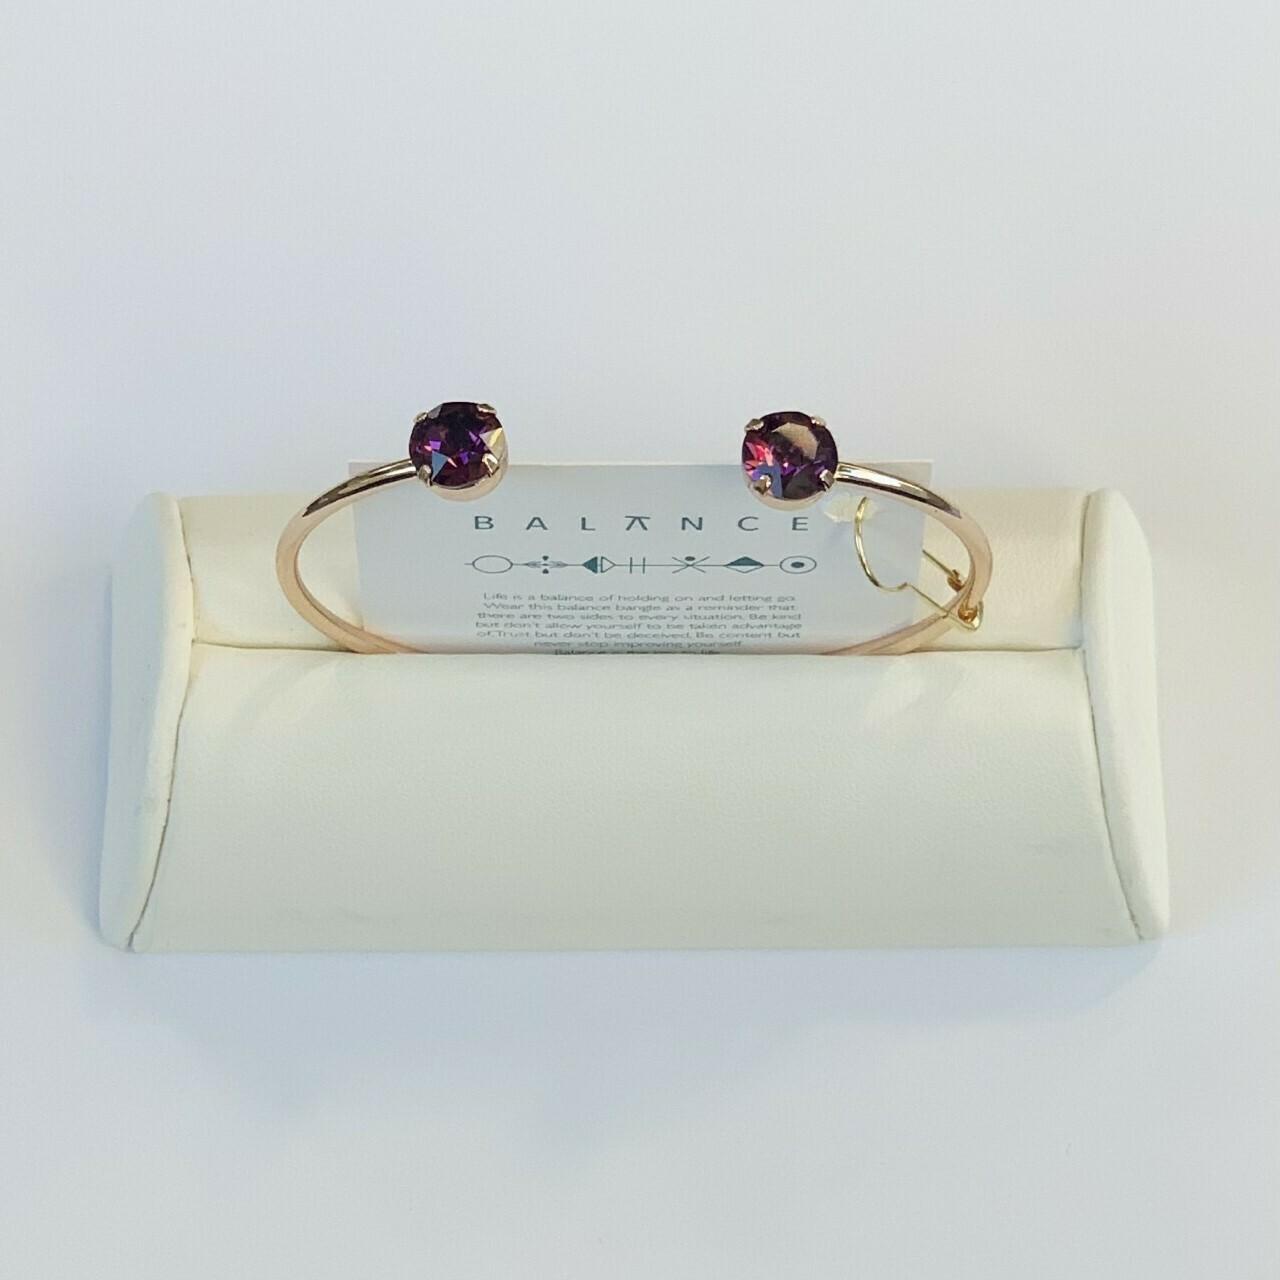 Balance Bracelet Gold/Amethyst